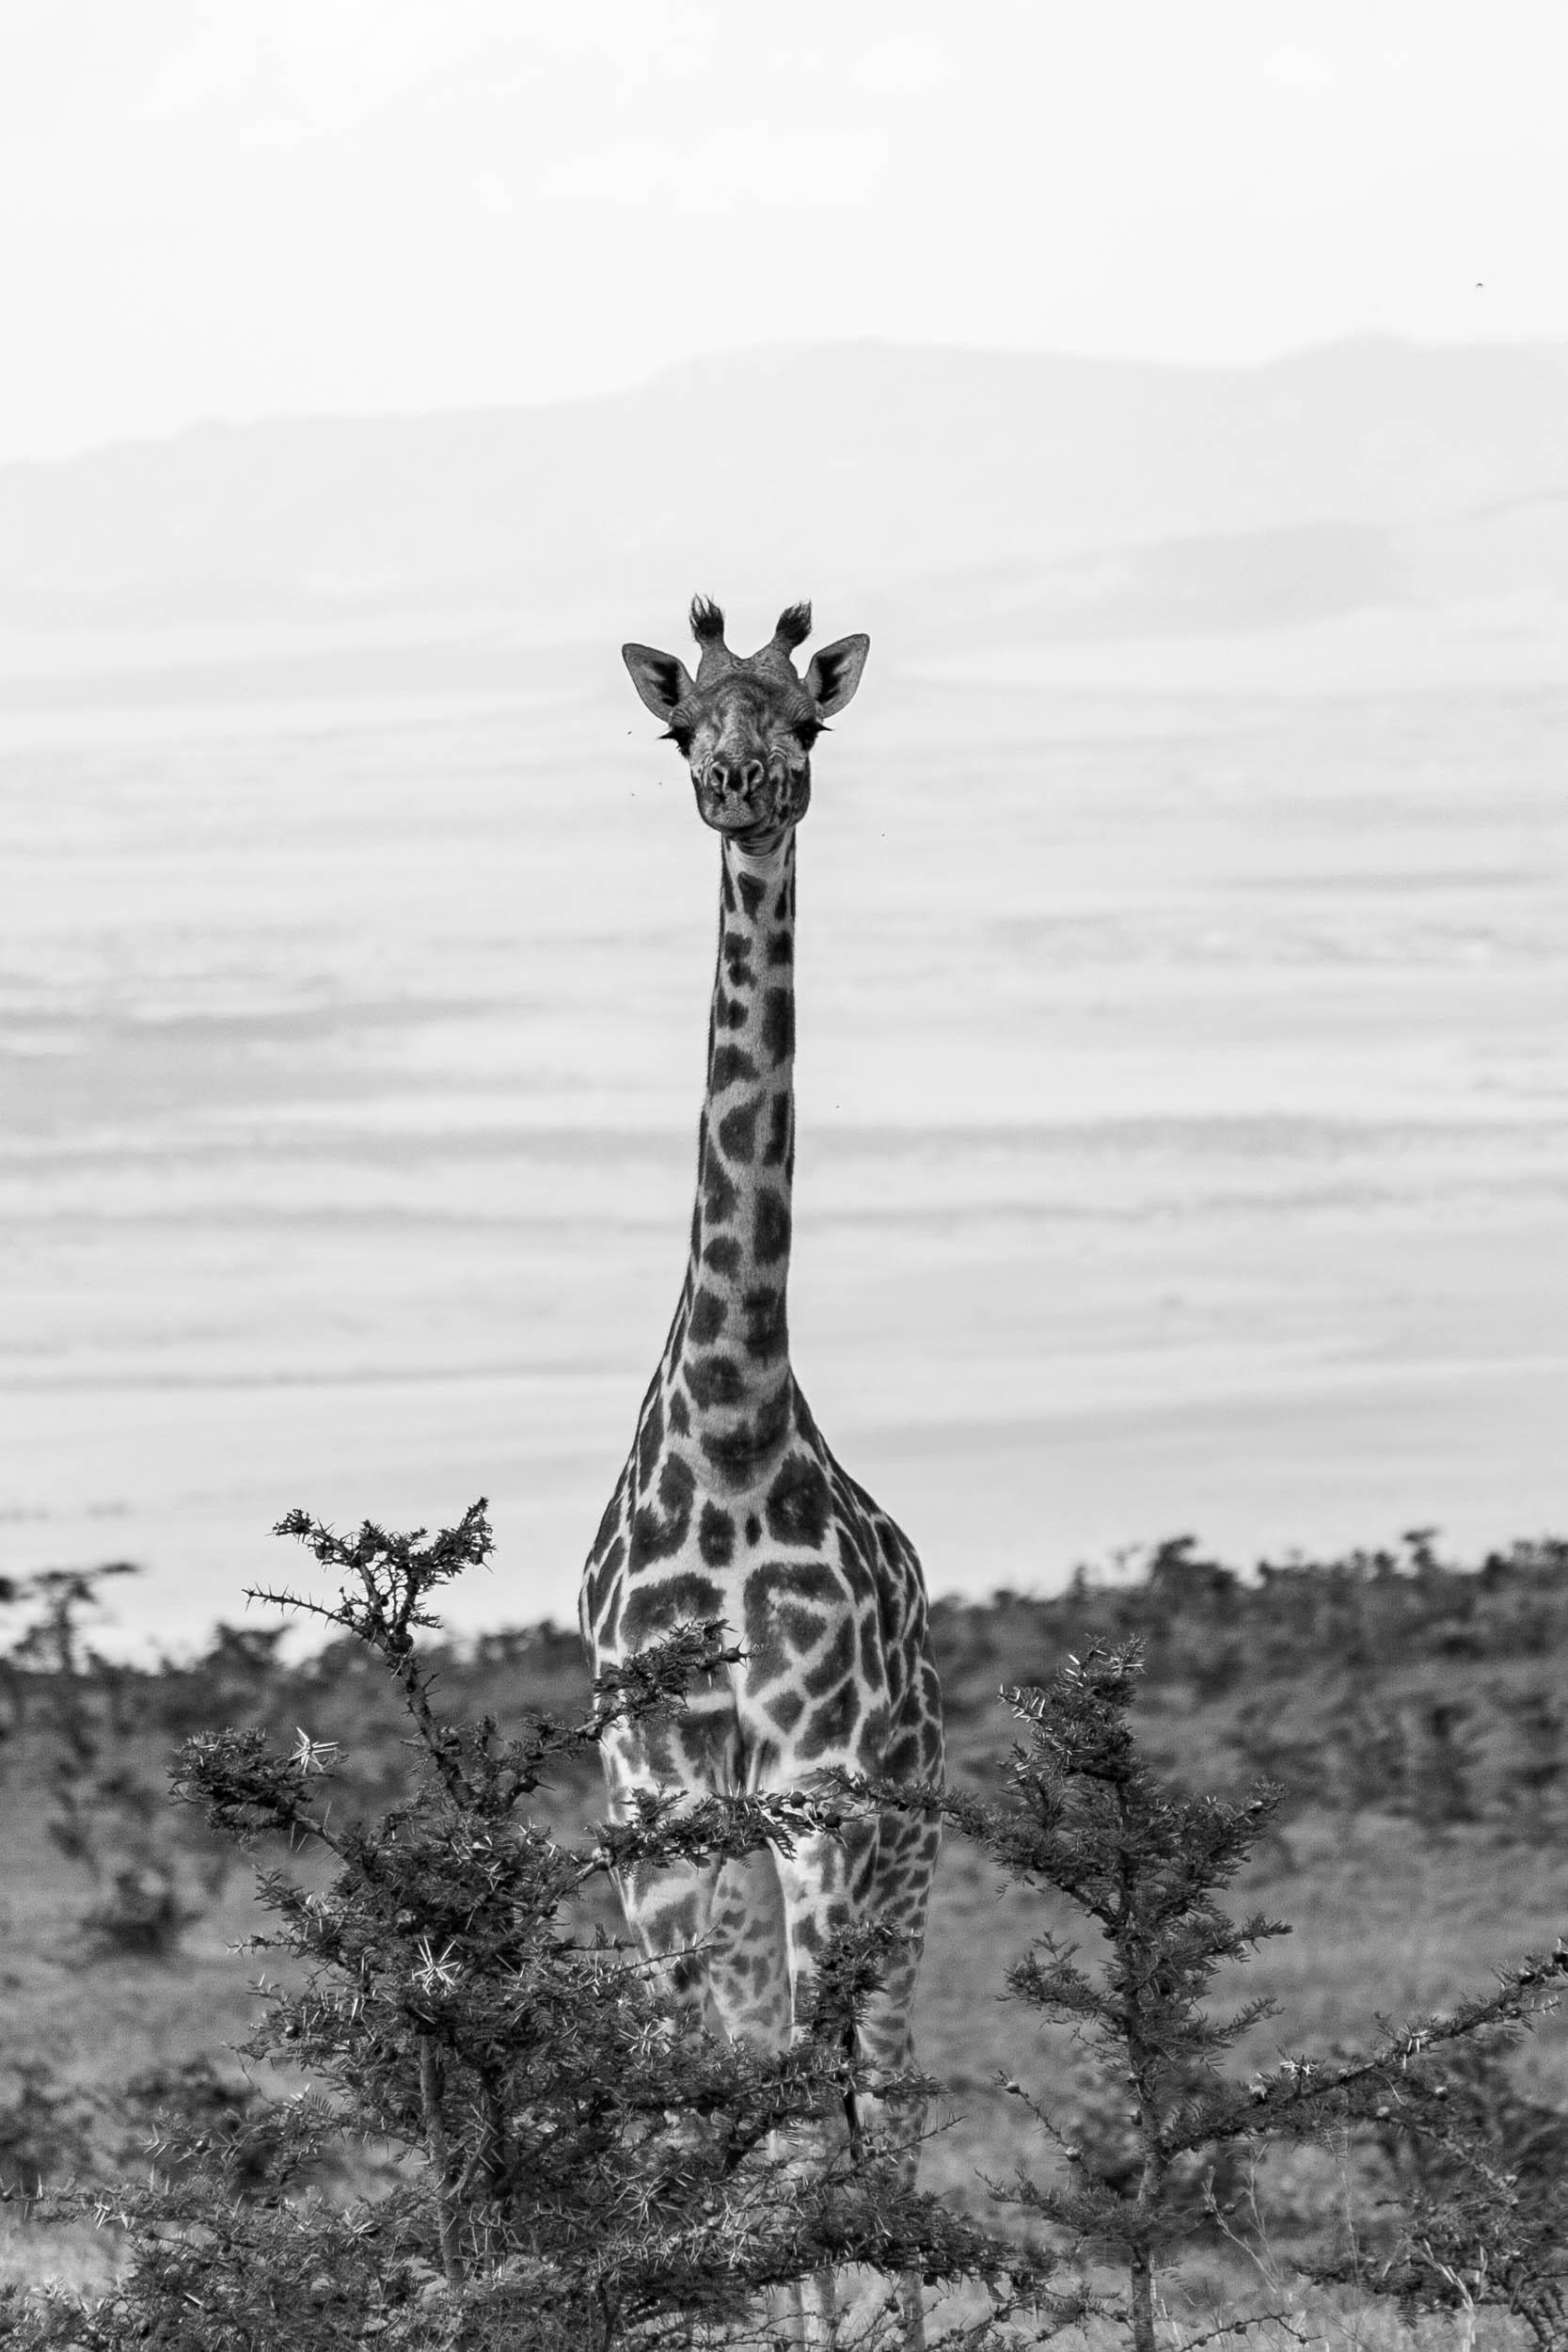 Tanzania-Safari-2010-94.jpg